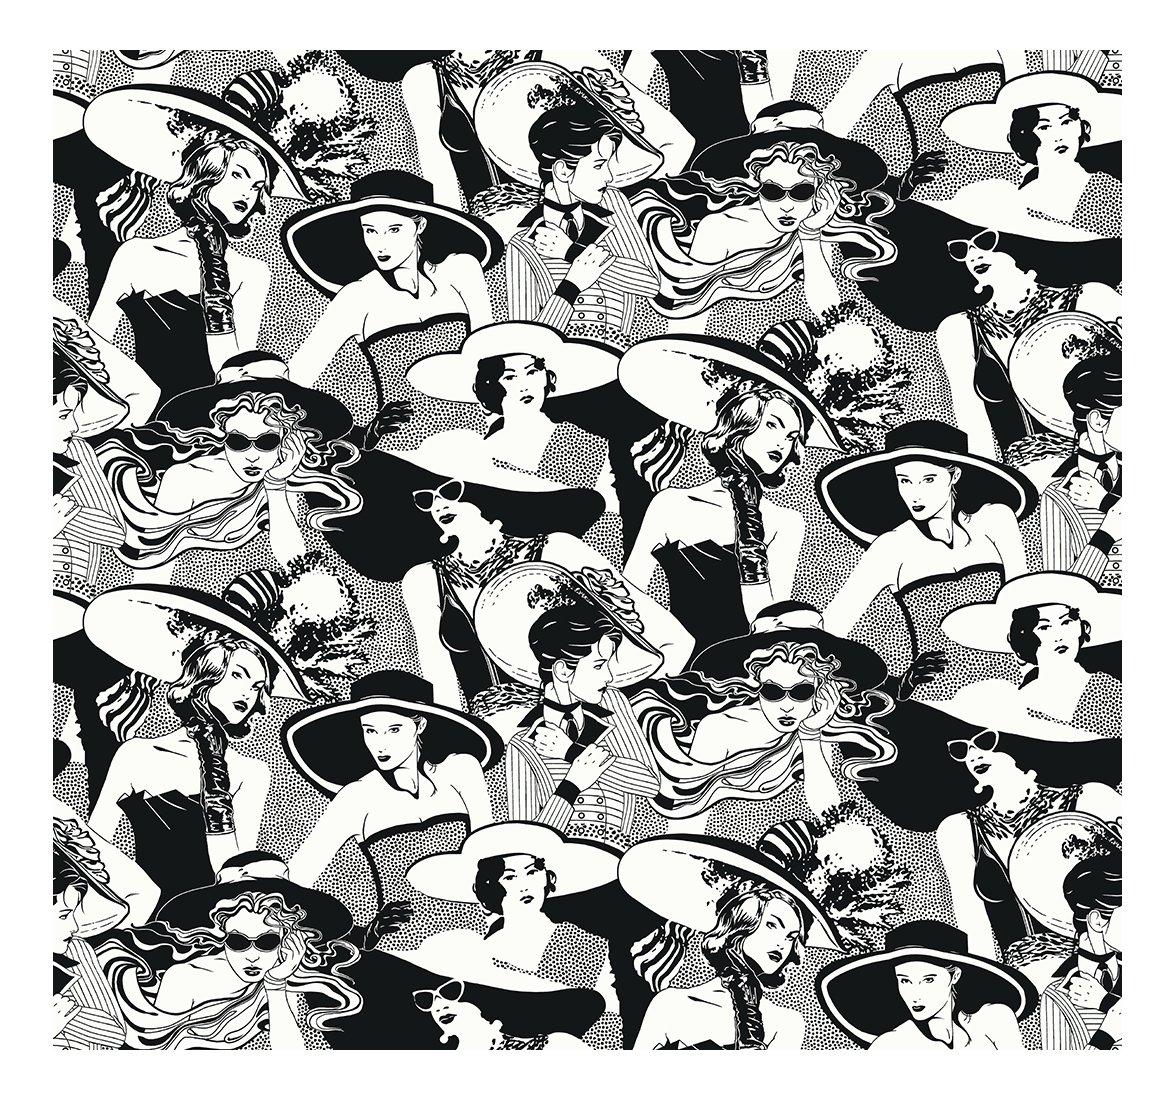 York Wallcoverings BL0332SMP Tres Chic Ladies In WiDebrim 8 x 10 Wallpaper Memo Sample